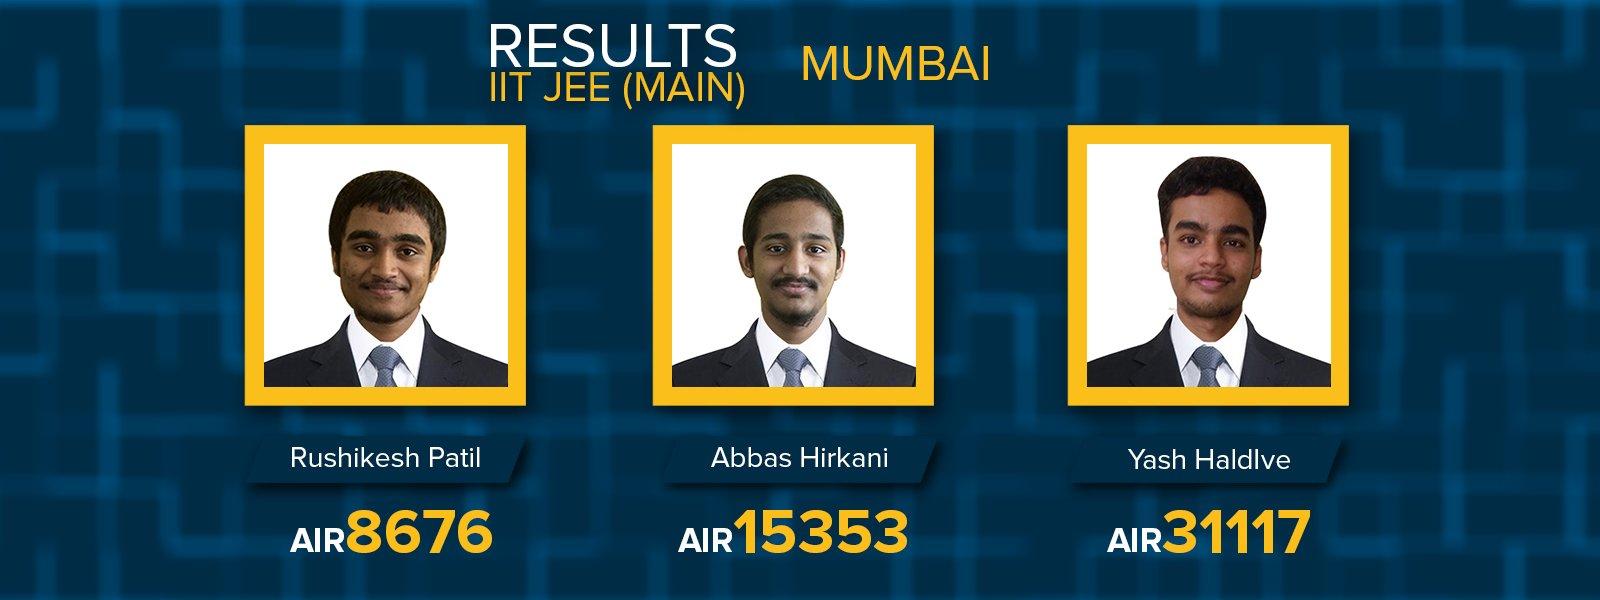 Mumbai IIT JEE MAIN 2017 results